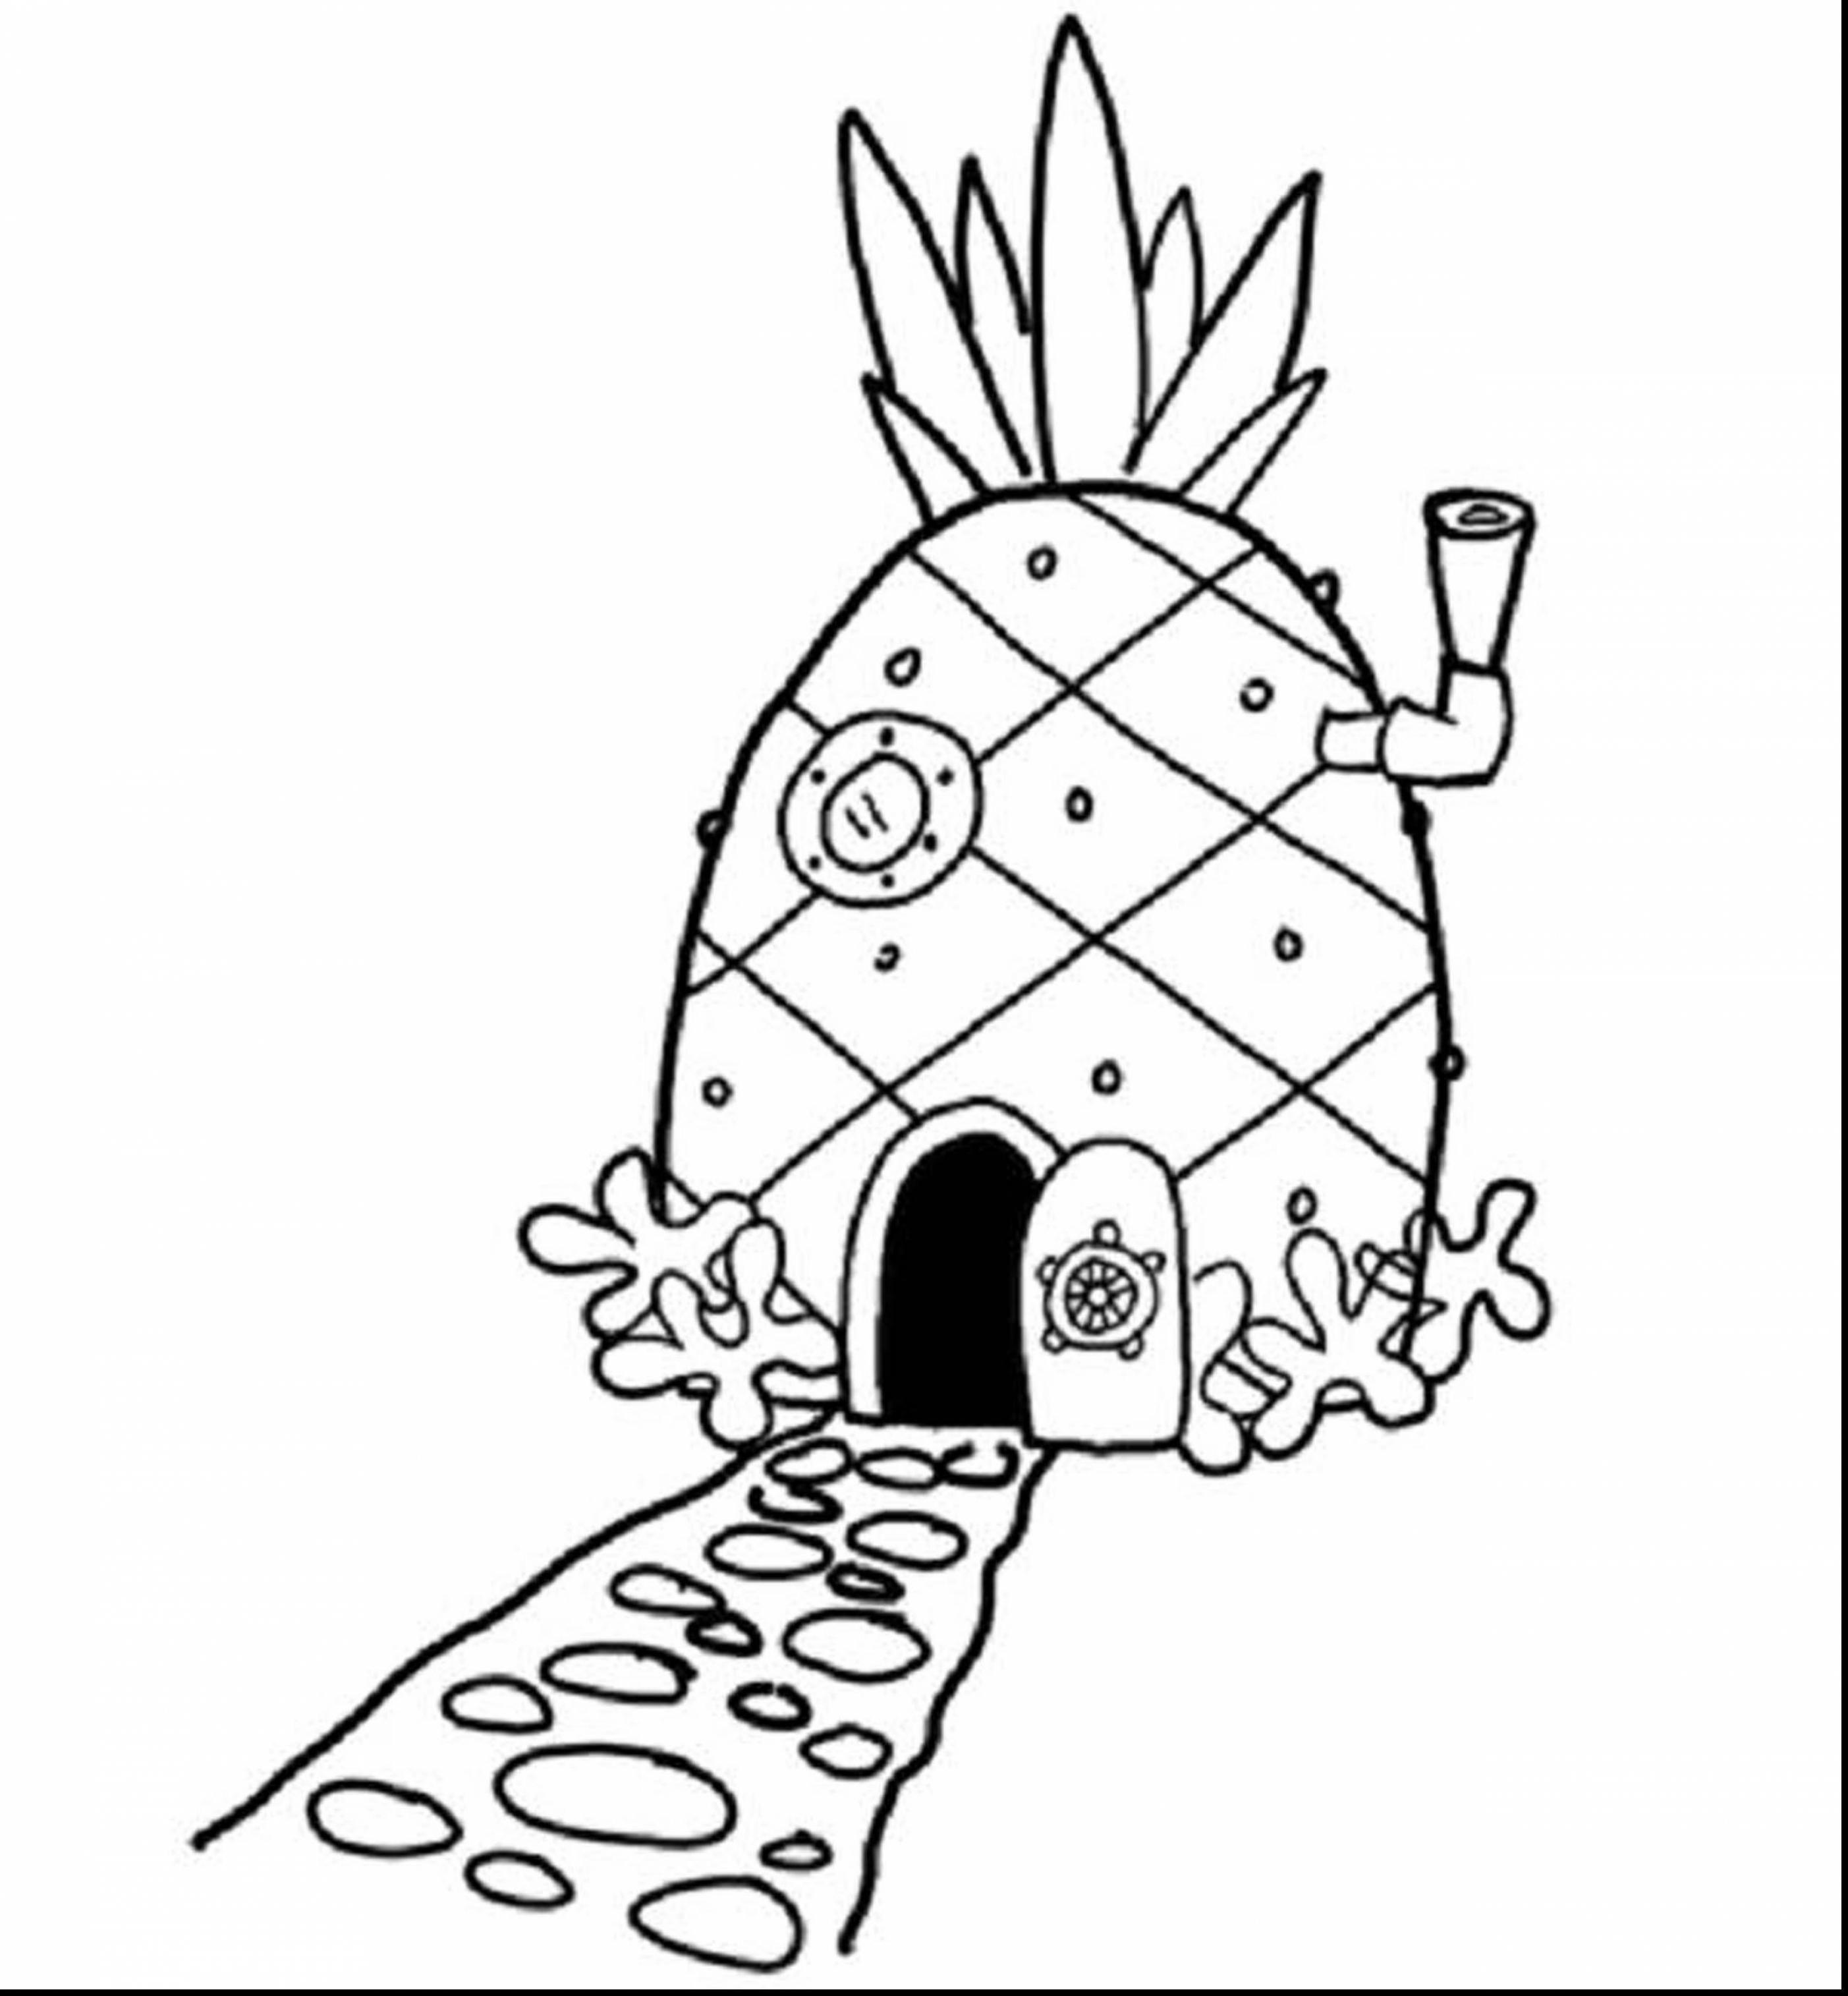 Pineapple Coloring Pages Coloring Pages Coloring Pages Spongebob